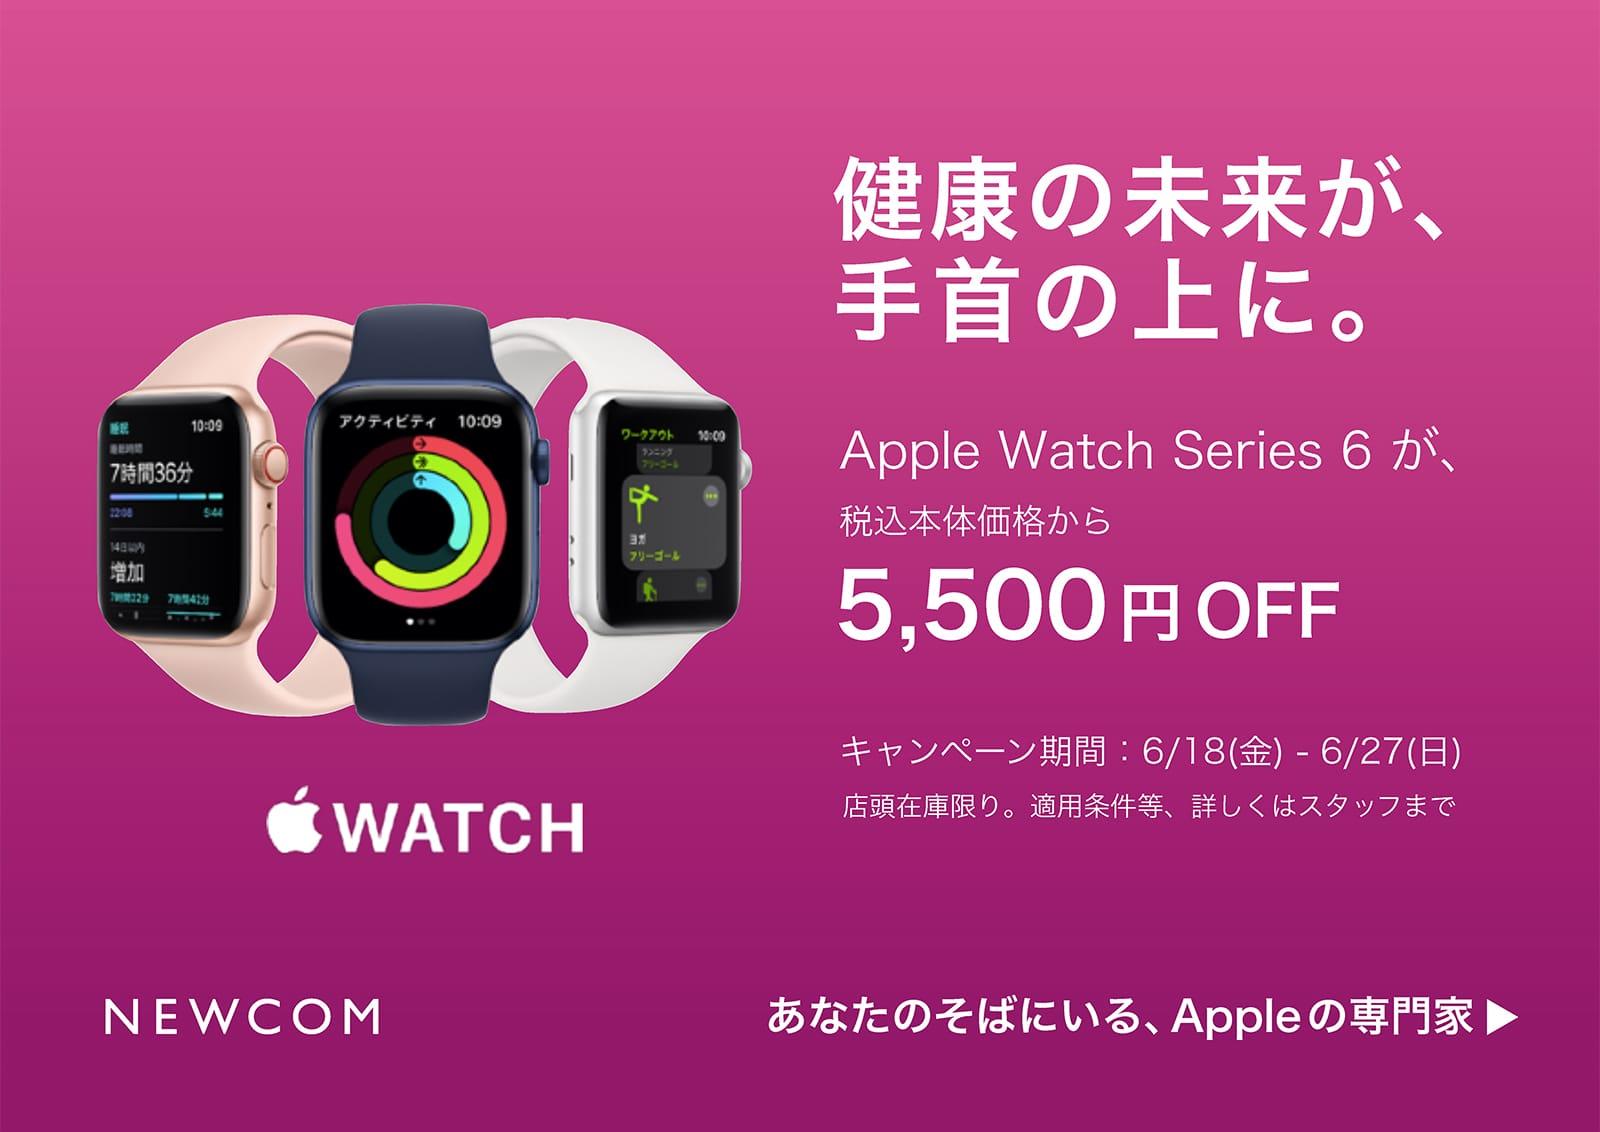 NEWCOM、「Apple Watch Series 6」を5,500円オフ、「iPhone 12 mini」「iPhone SE」を3,300円オフで提供